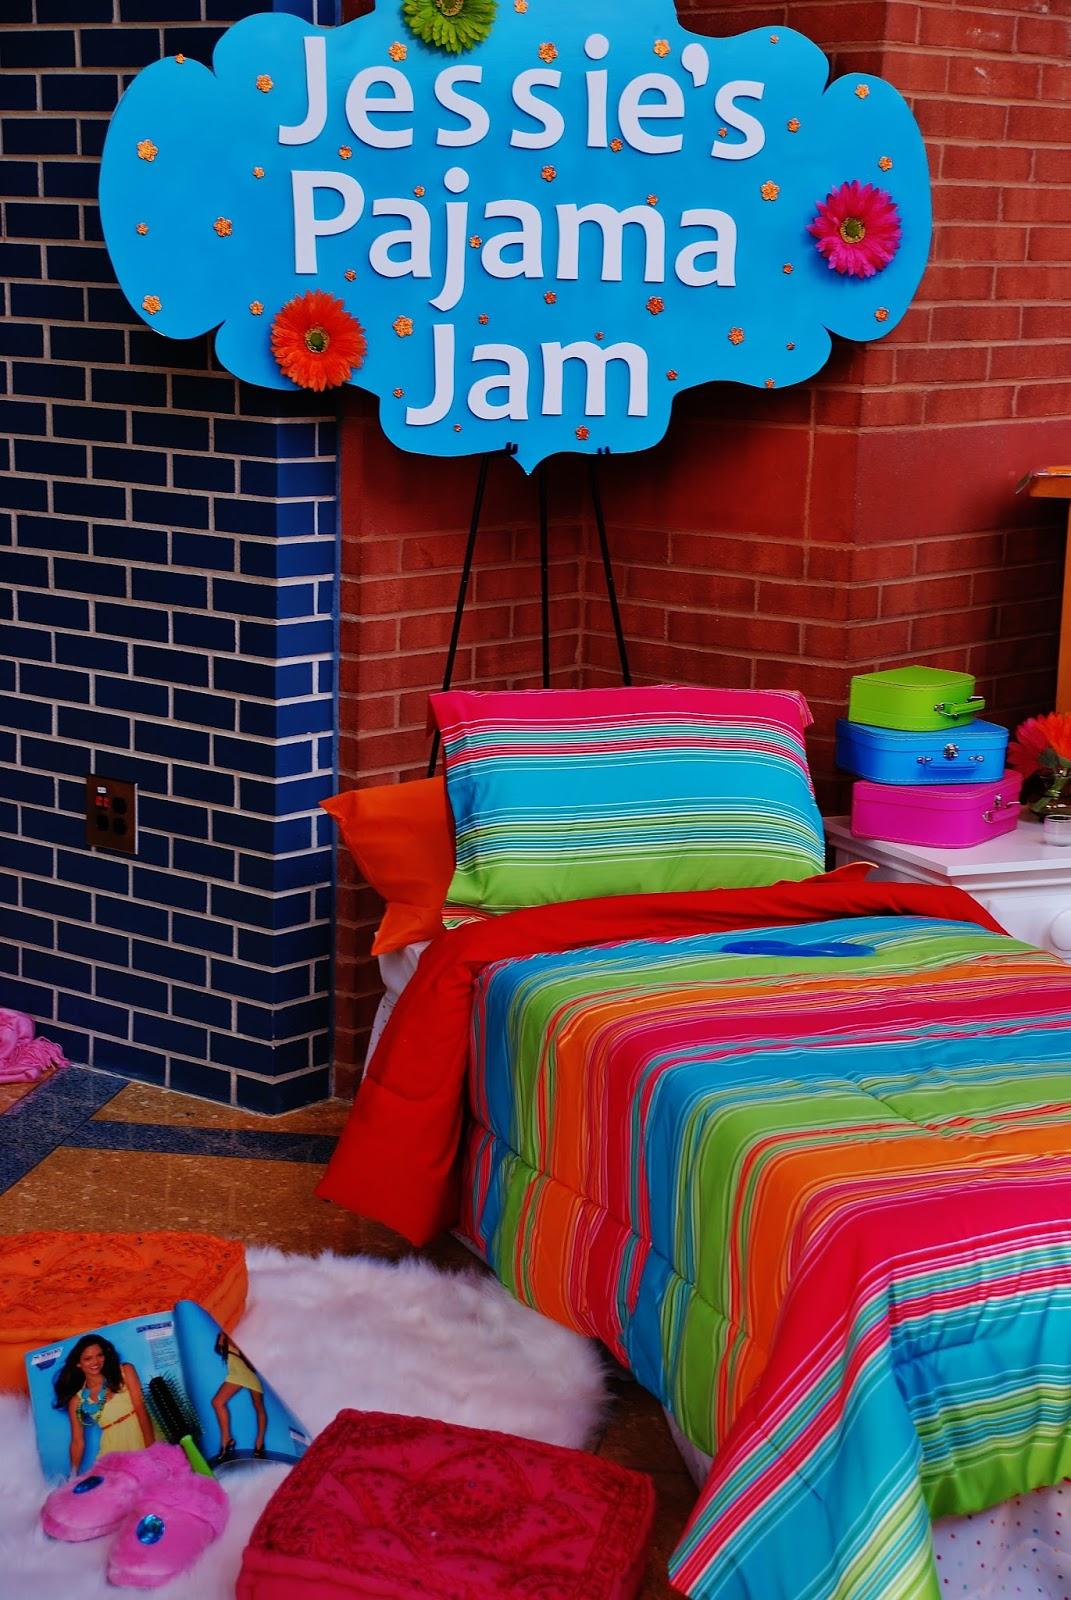 setting the mood jessie 39 s pajama jam. Black Bedroom Furniture Sets. Home Design Ideas